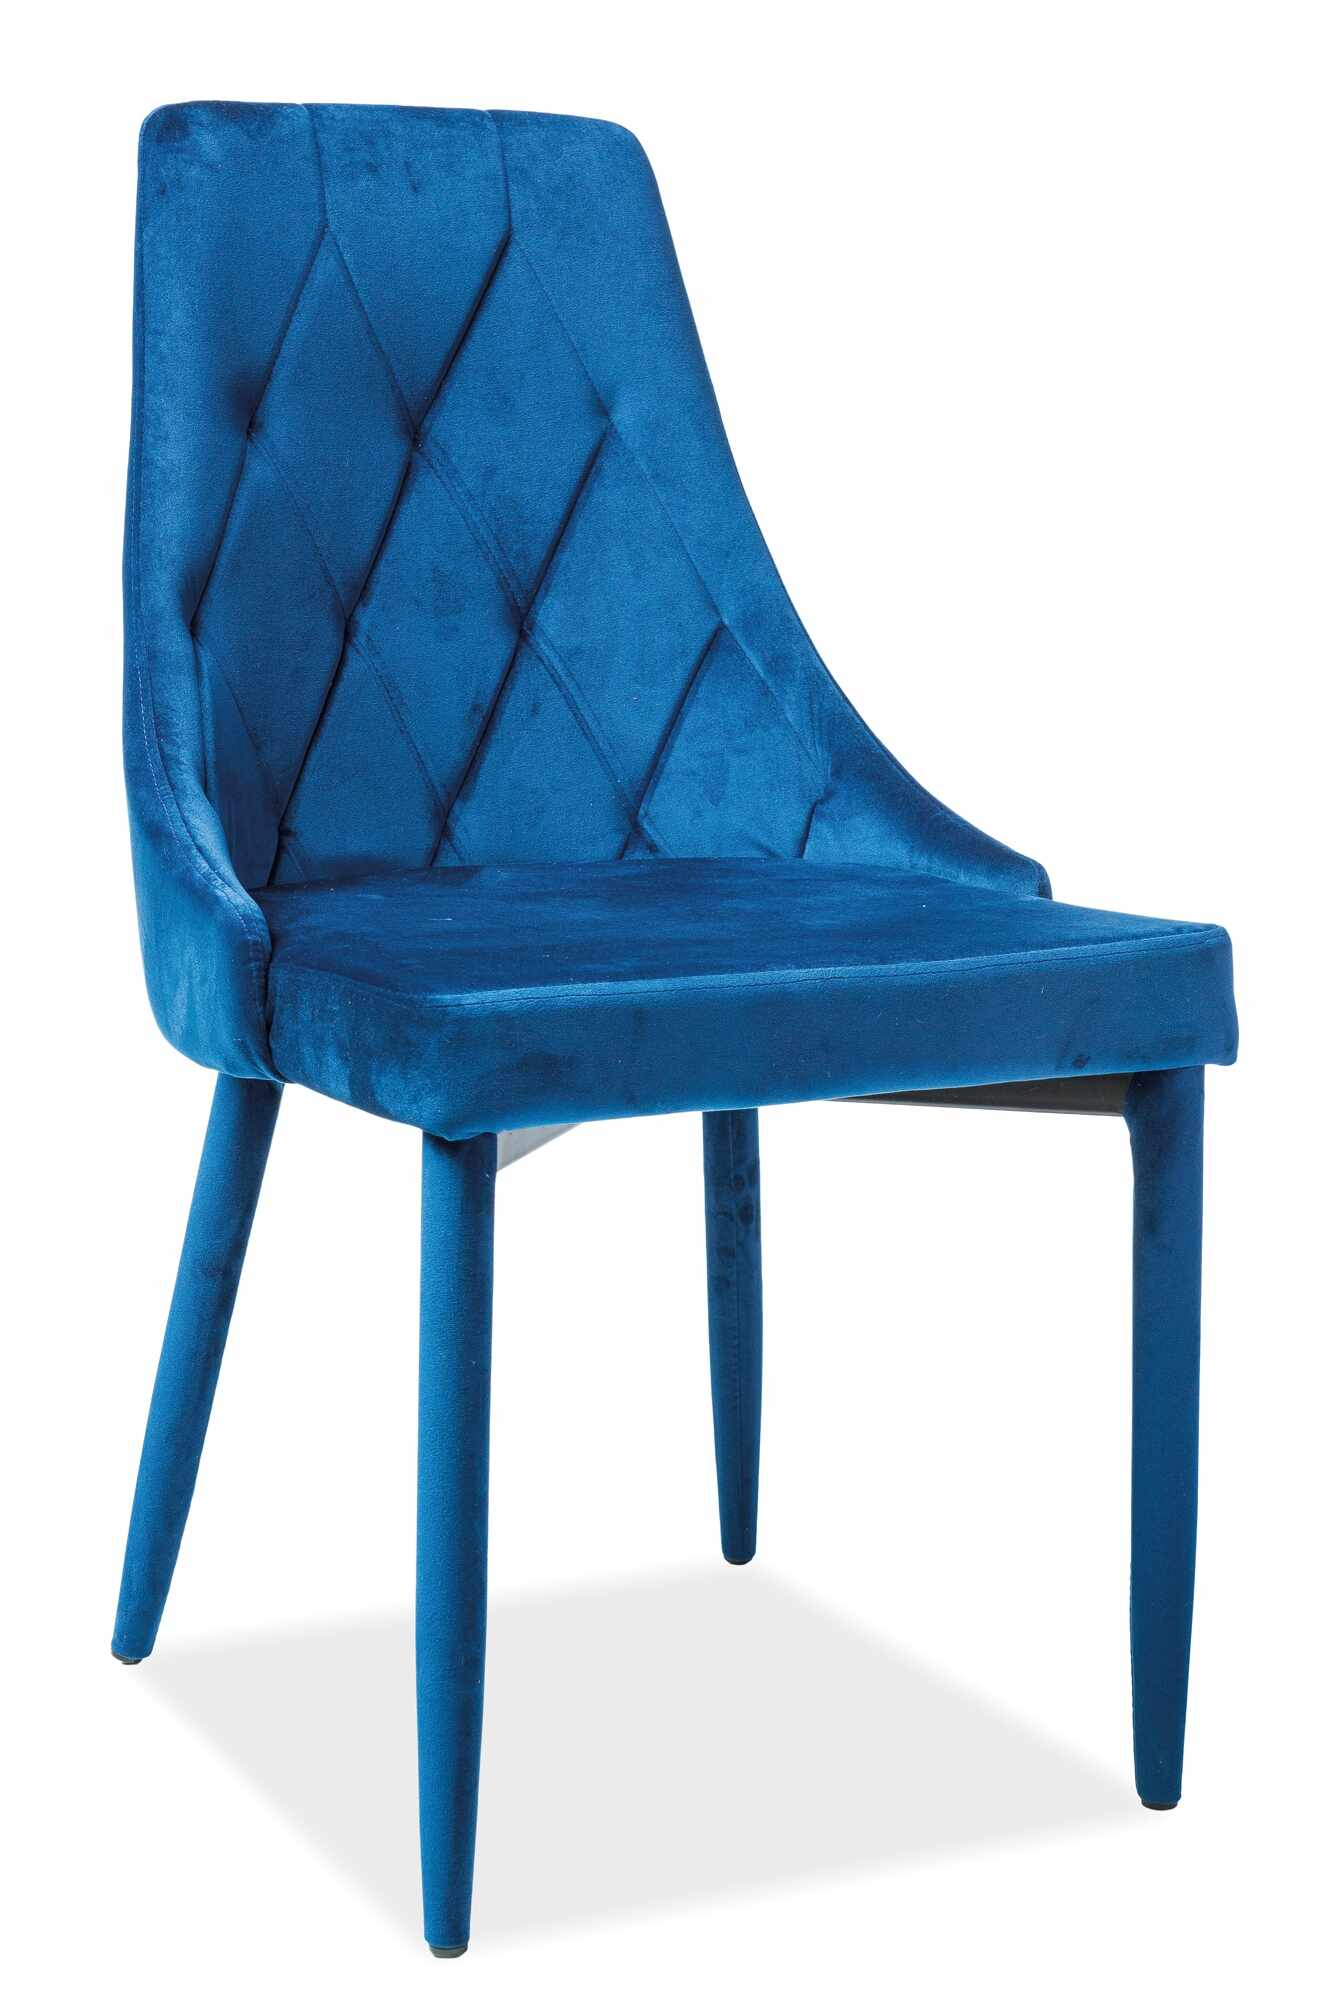 Scaun tapitat cu stofa si picioare metalice Trix Velvet Bleumarin, l46xA46xH88 cm la pret 288 lei